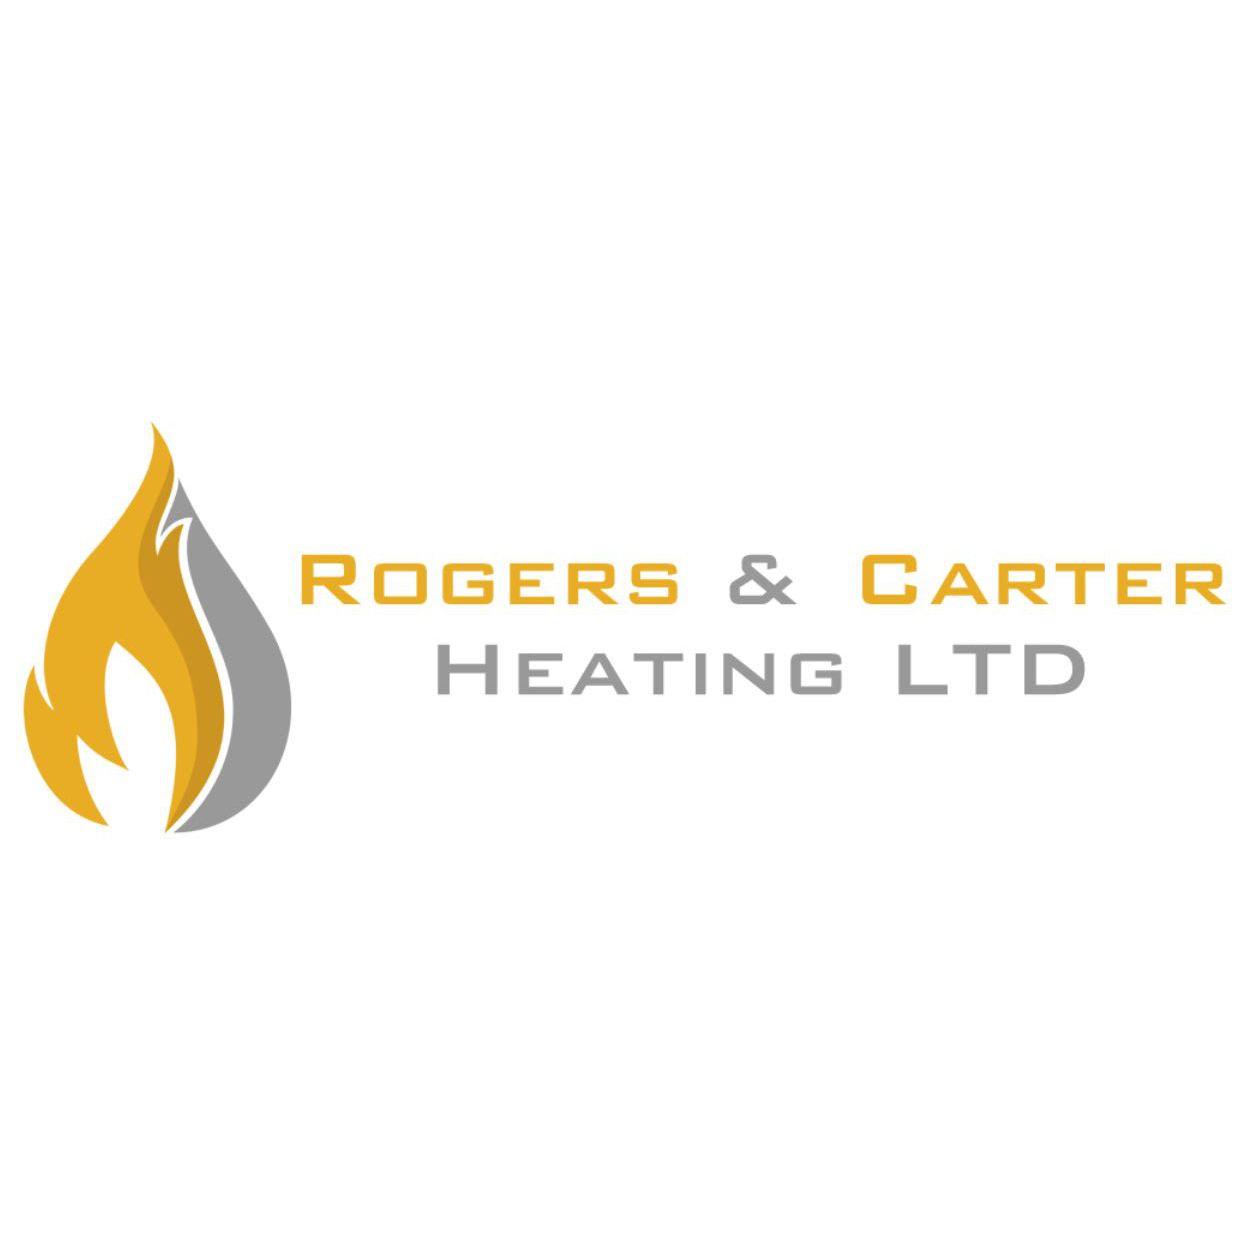 Rogers & Carter Heating Ltd - Camberley, Hampshire GU17 0JX - 07515 966471 | ShowMeLocal.com